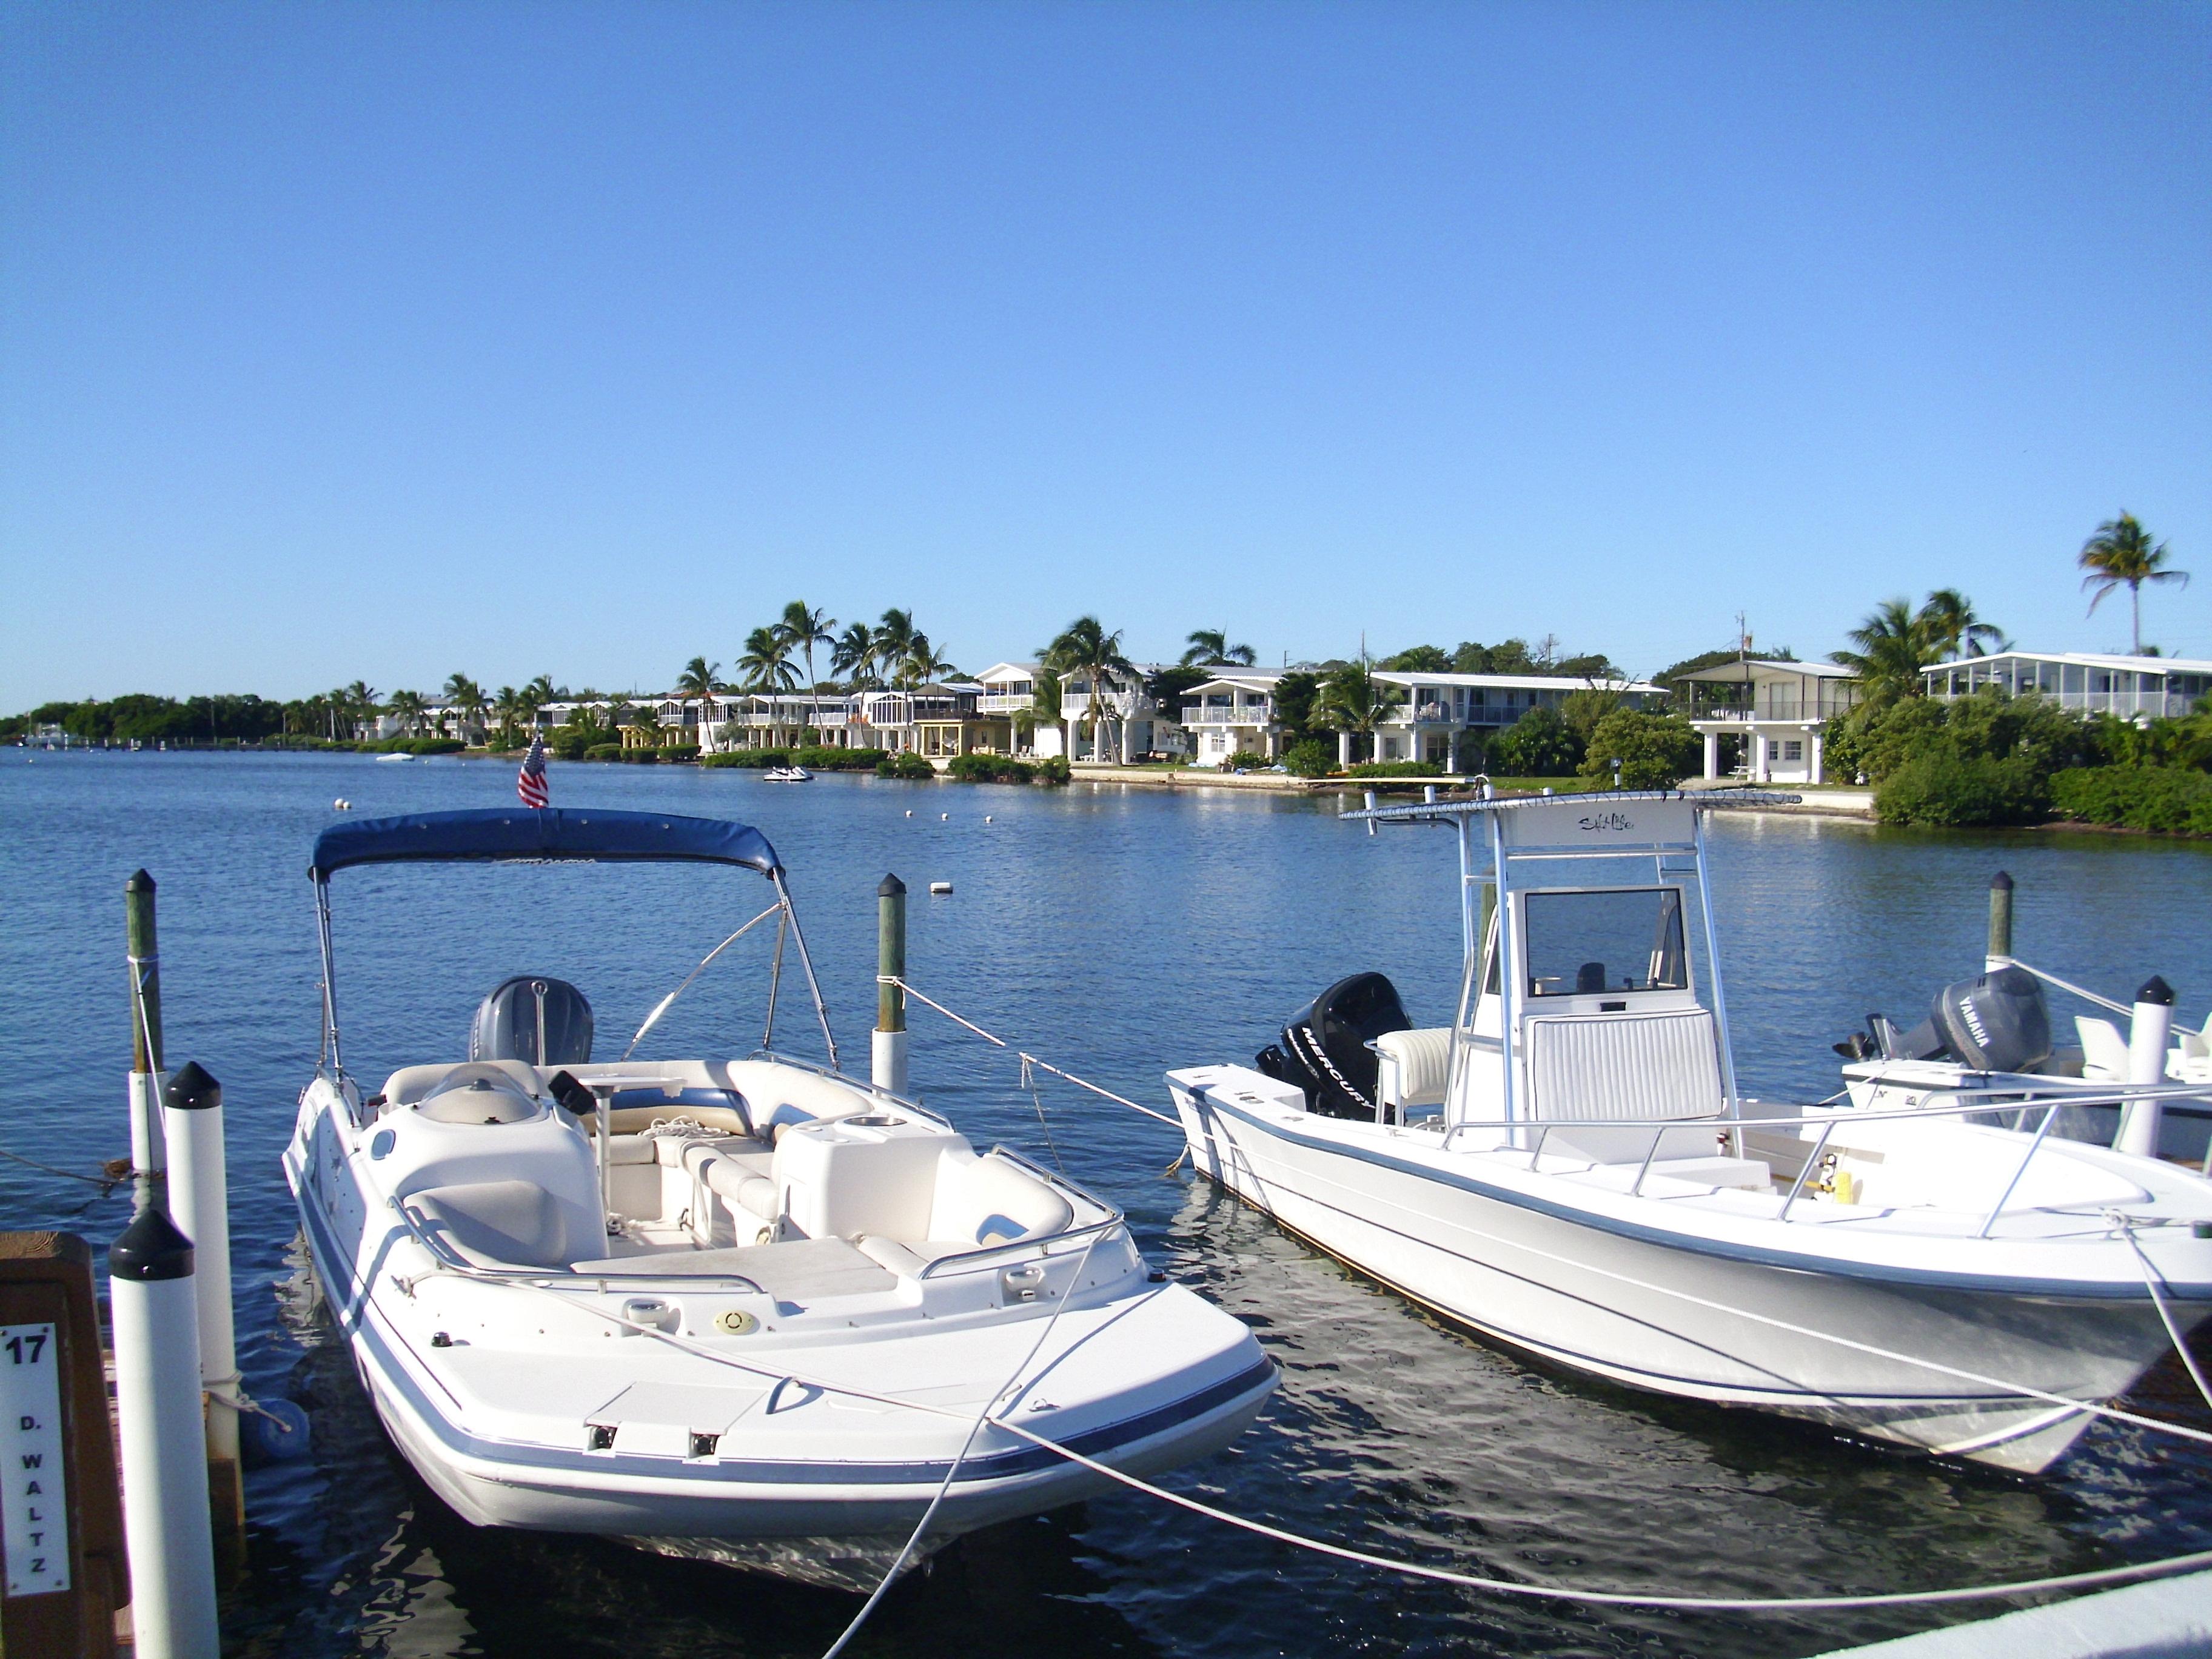 Boating and the Marina at Silver Shores Retirement